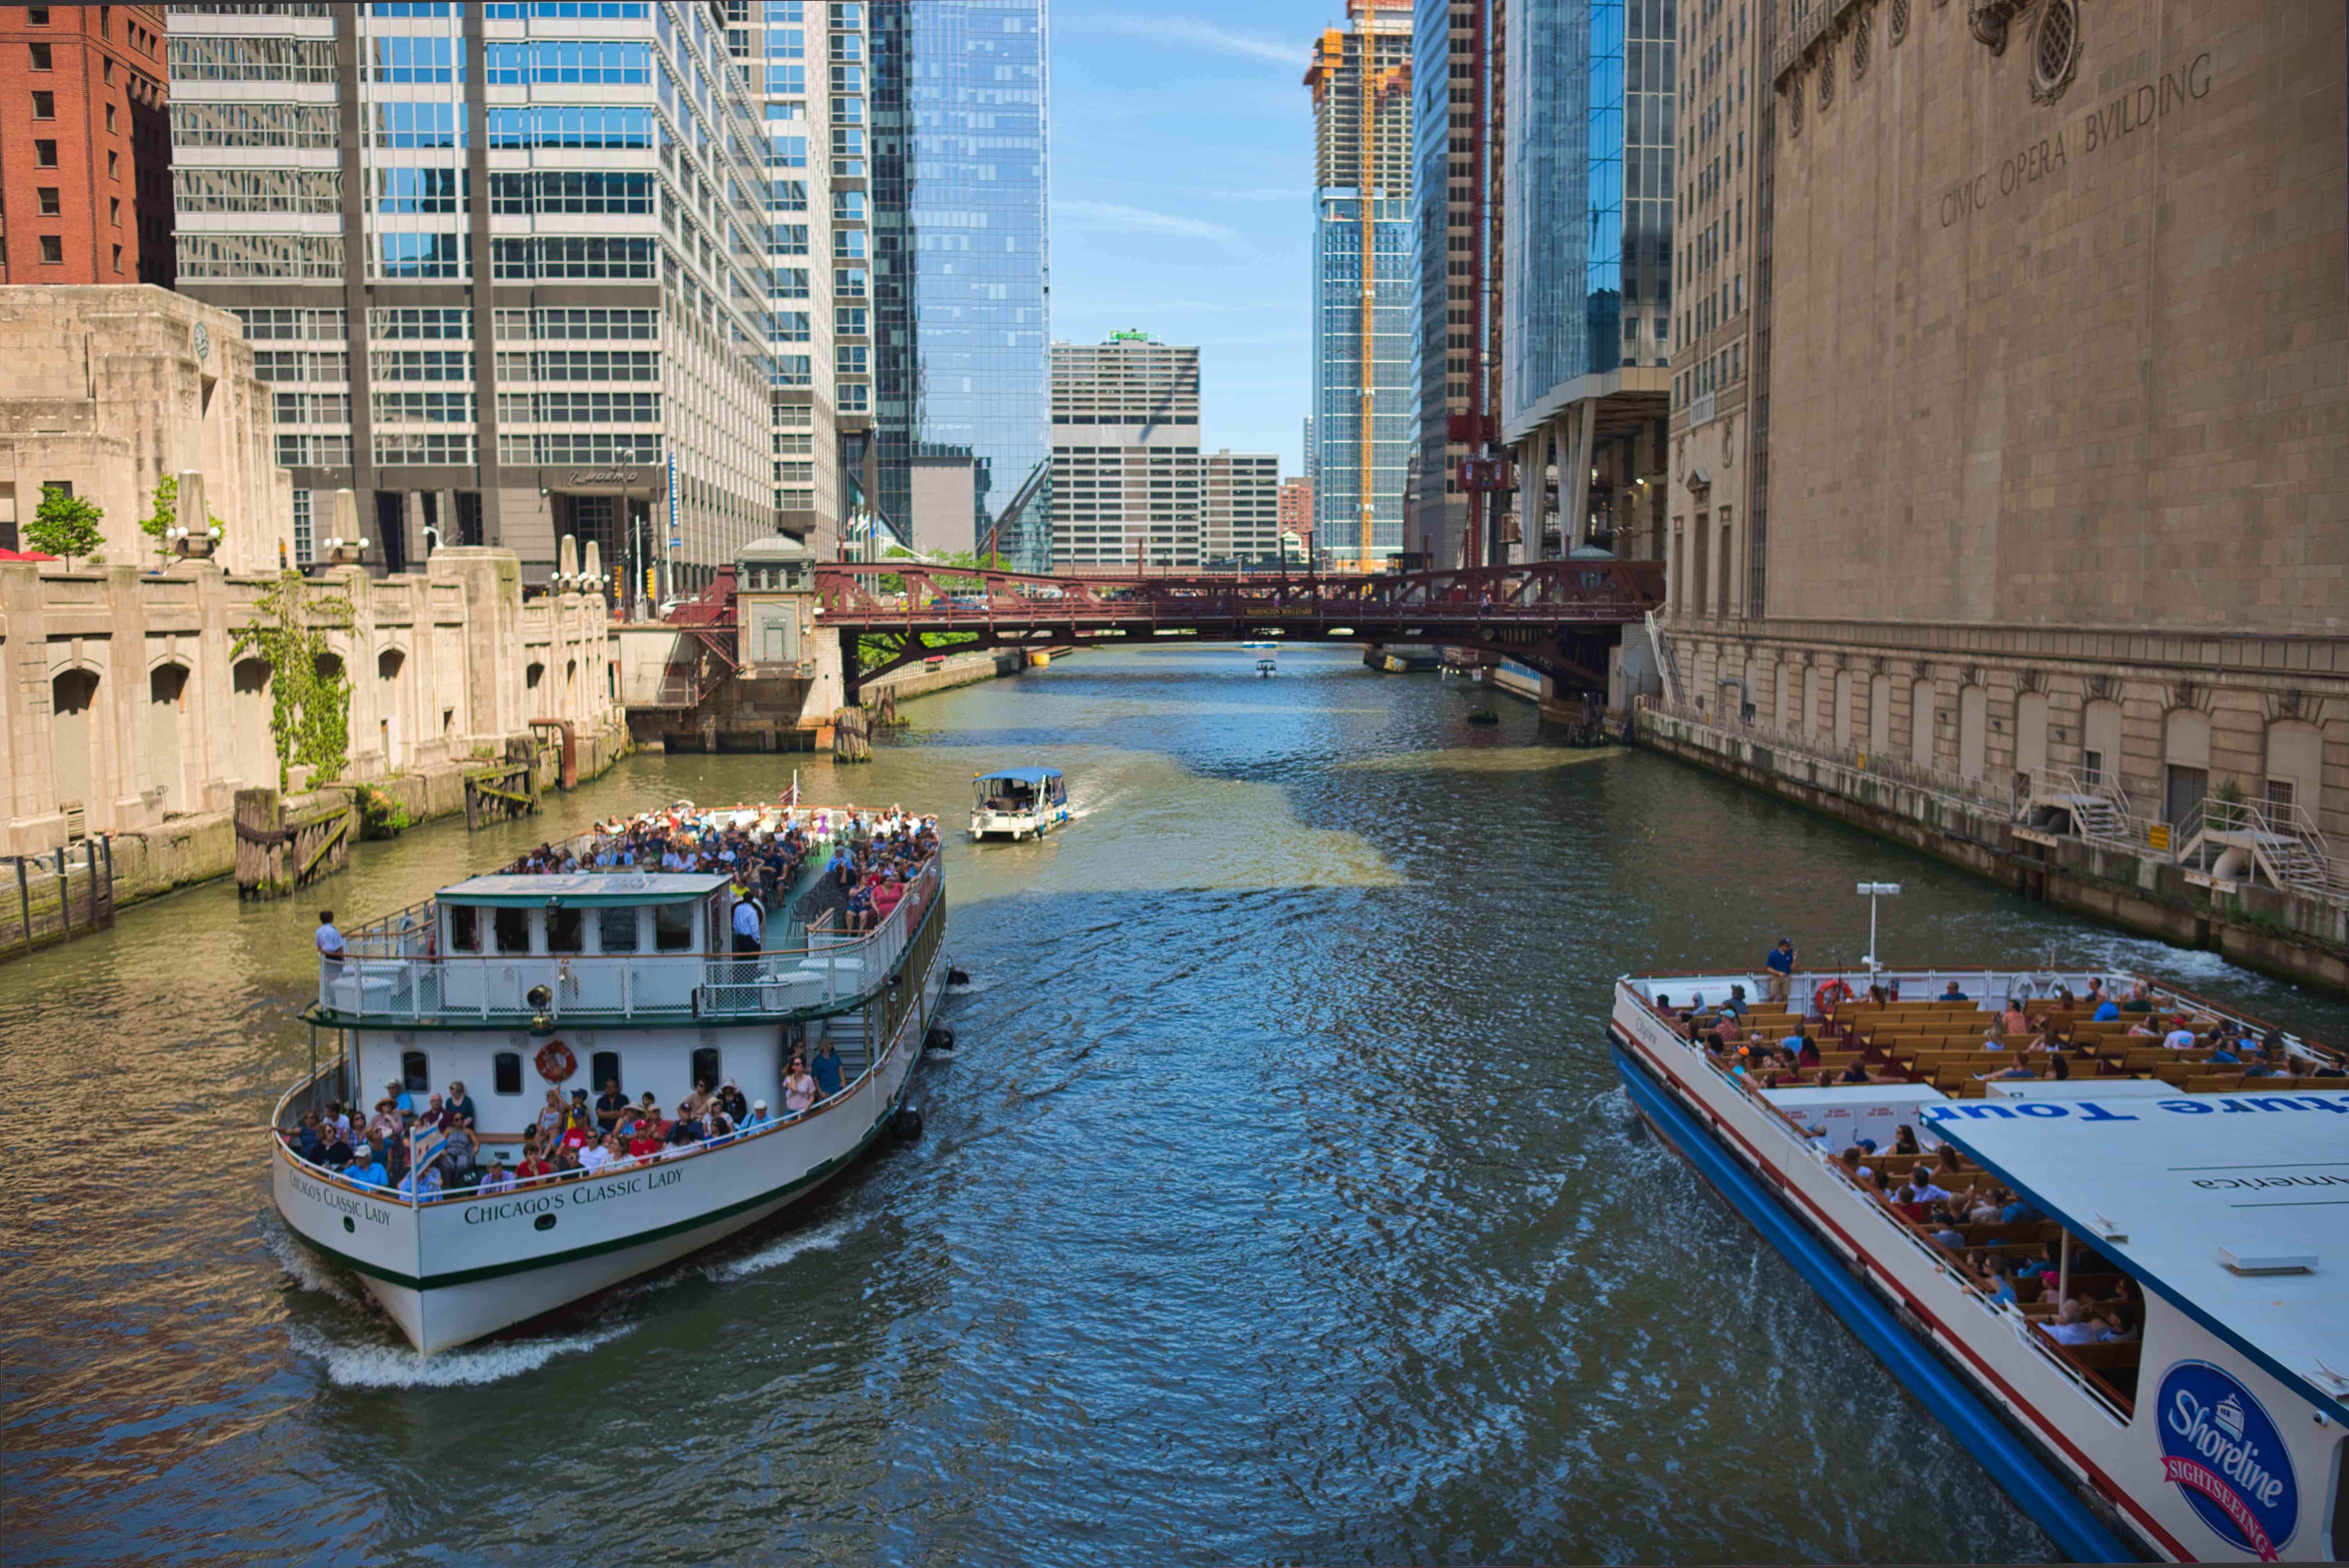 Architecture cruises in Chicago